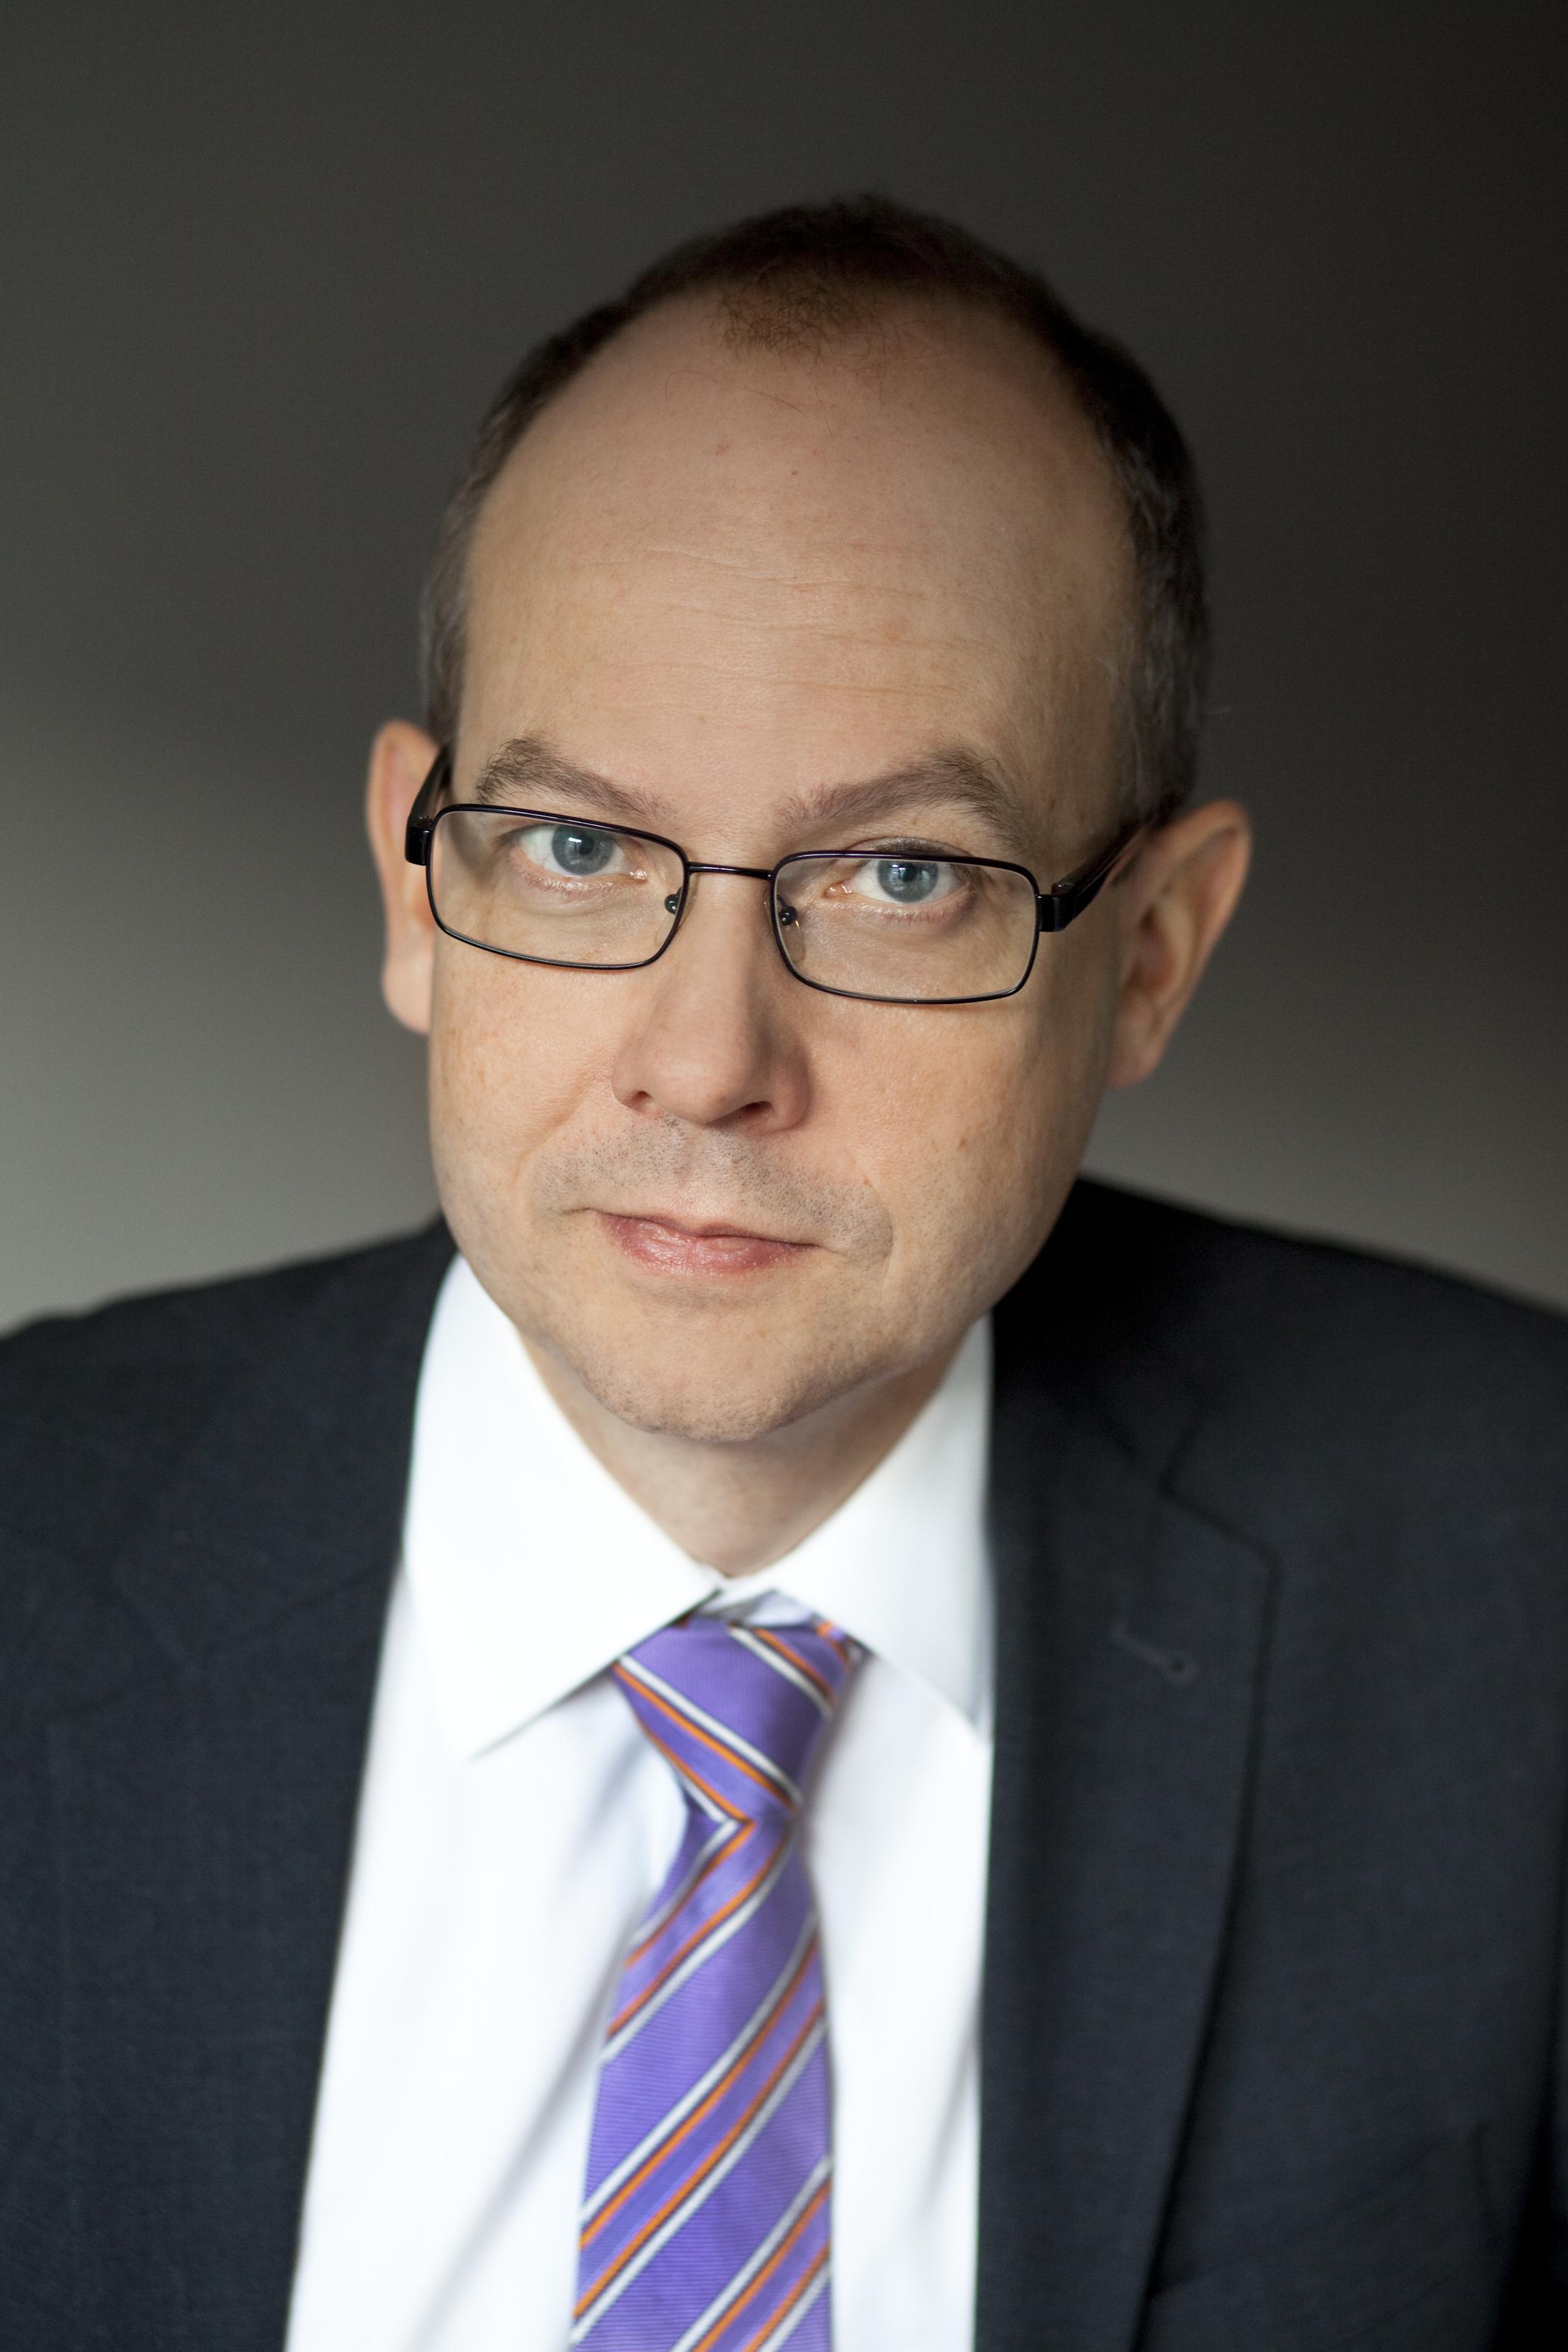 Martin Andersson, generaldirektör, Finansinspektionen - martin_andersson_mf6555press1